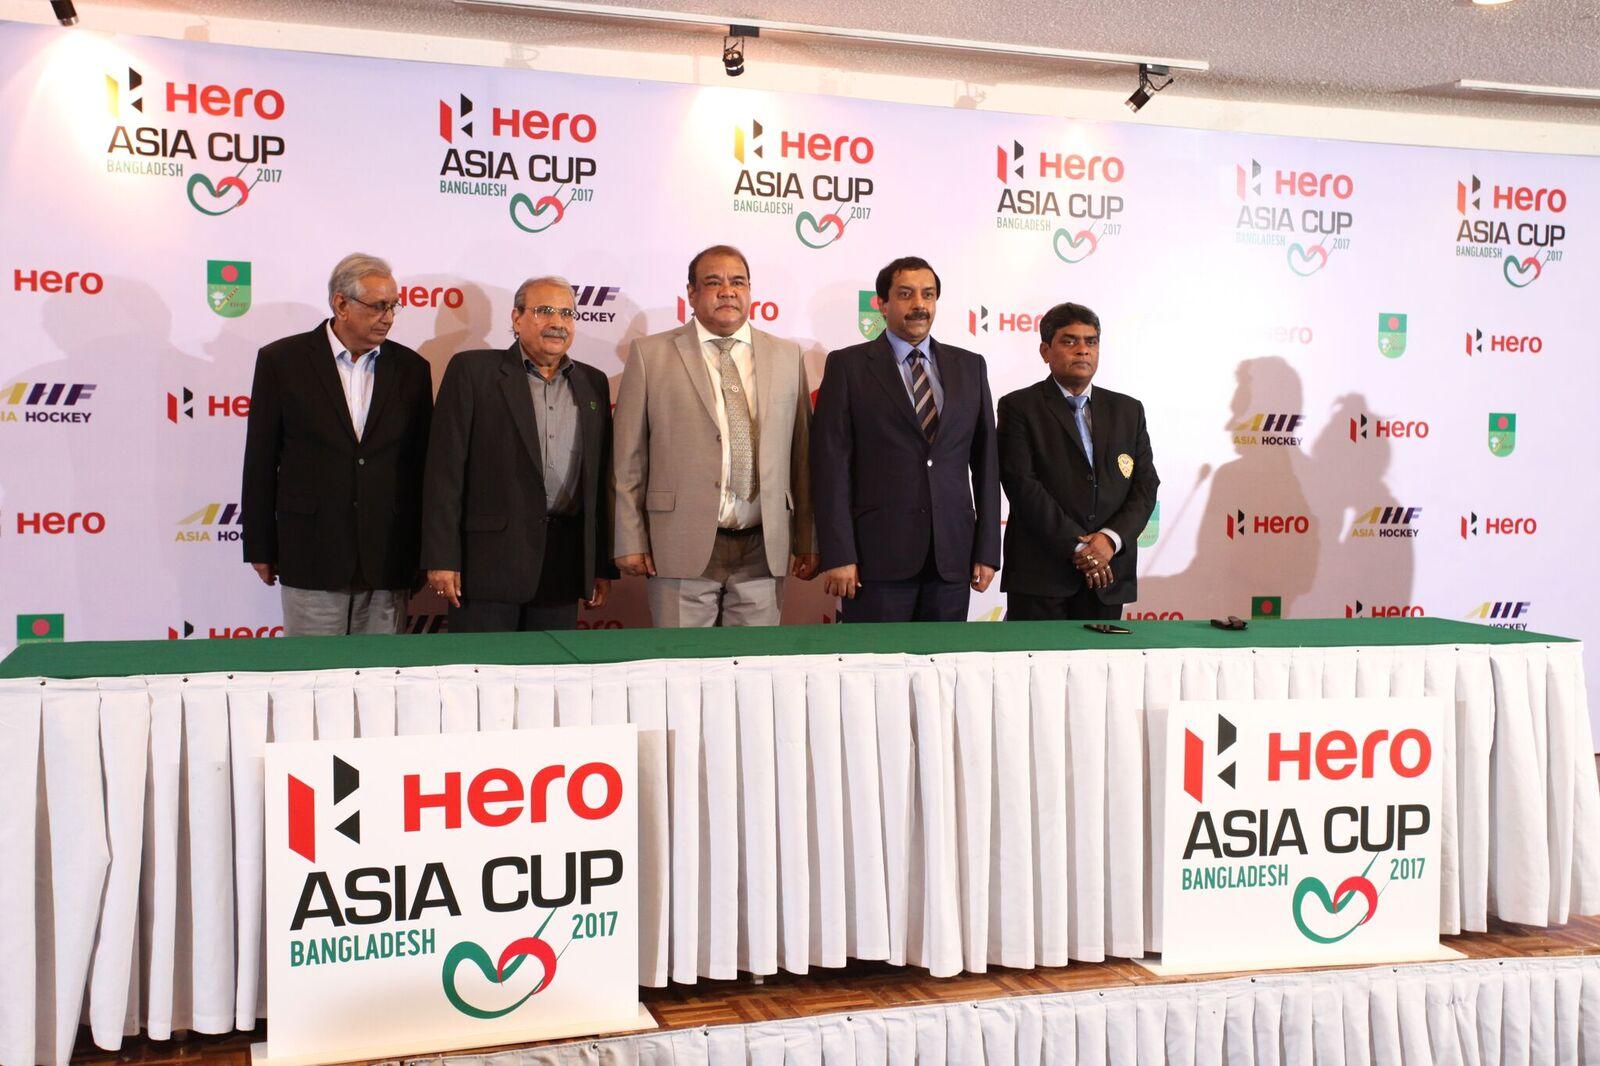 Abdus Sadeque, General Secretary of BHF, J Narain, Hero MotoCorp; Abu Esrar, President BHF, Tayyab Ikram, CEO, AHF, Abd  ur Rashid Shikdar, VP BHF